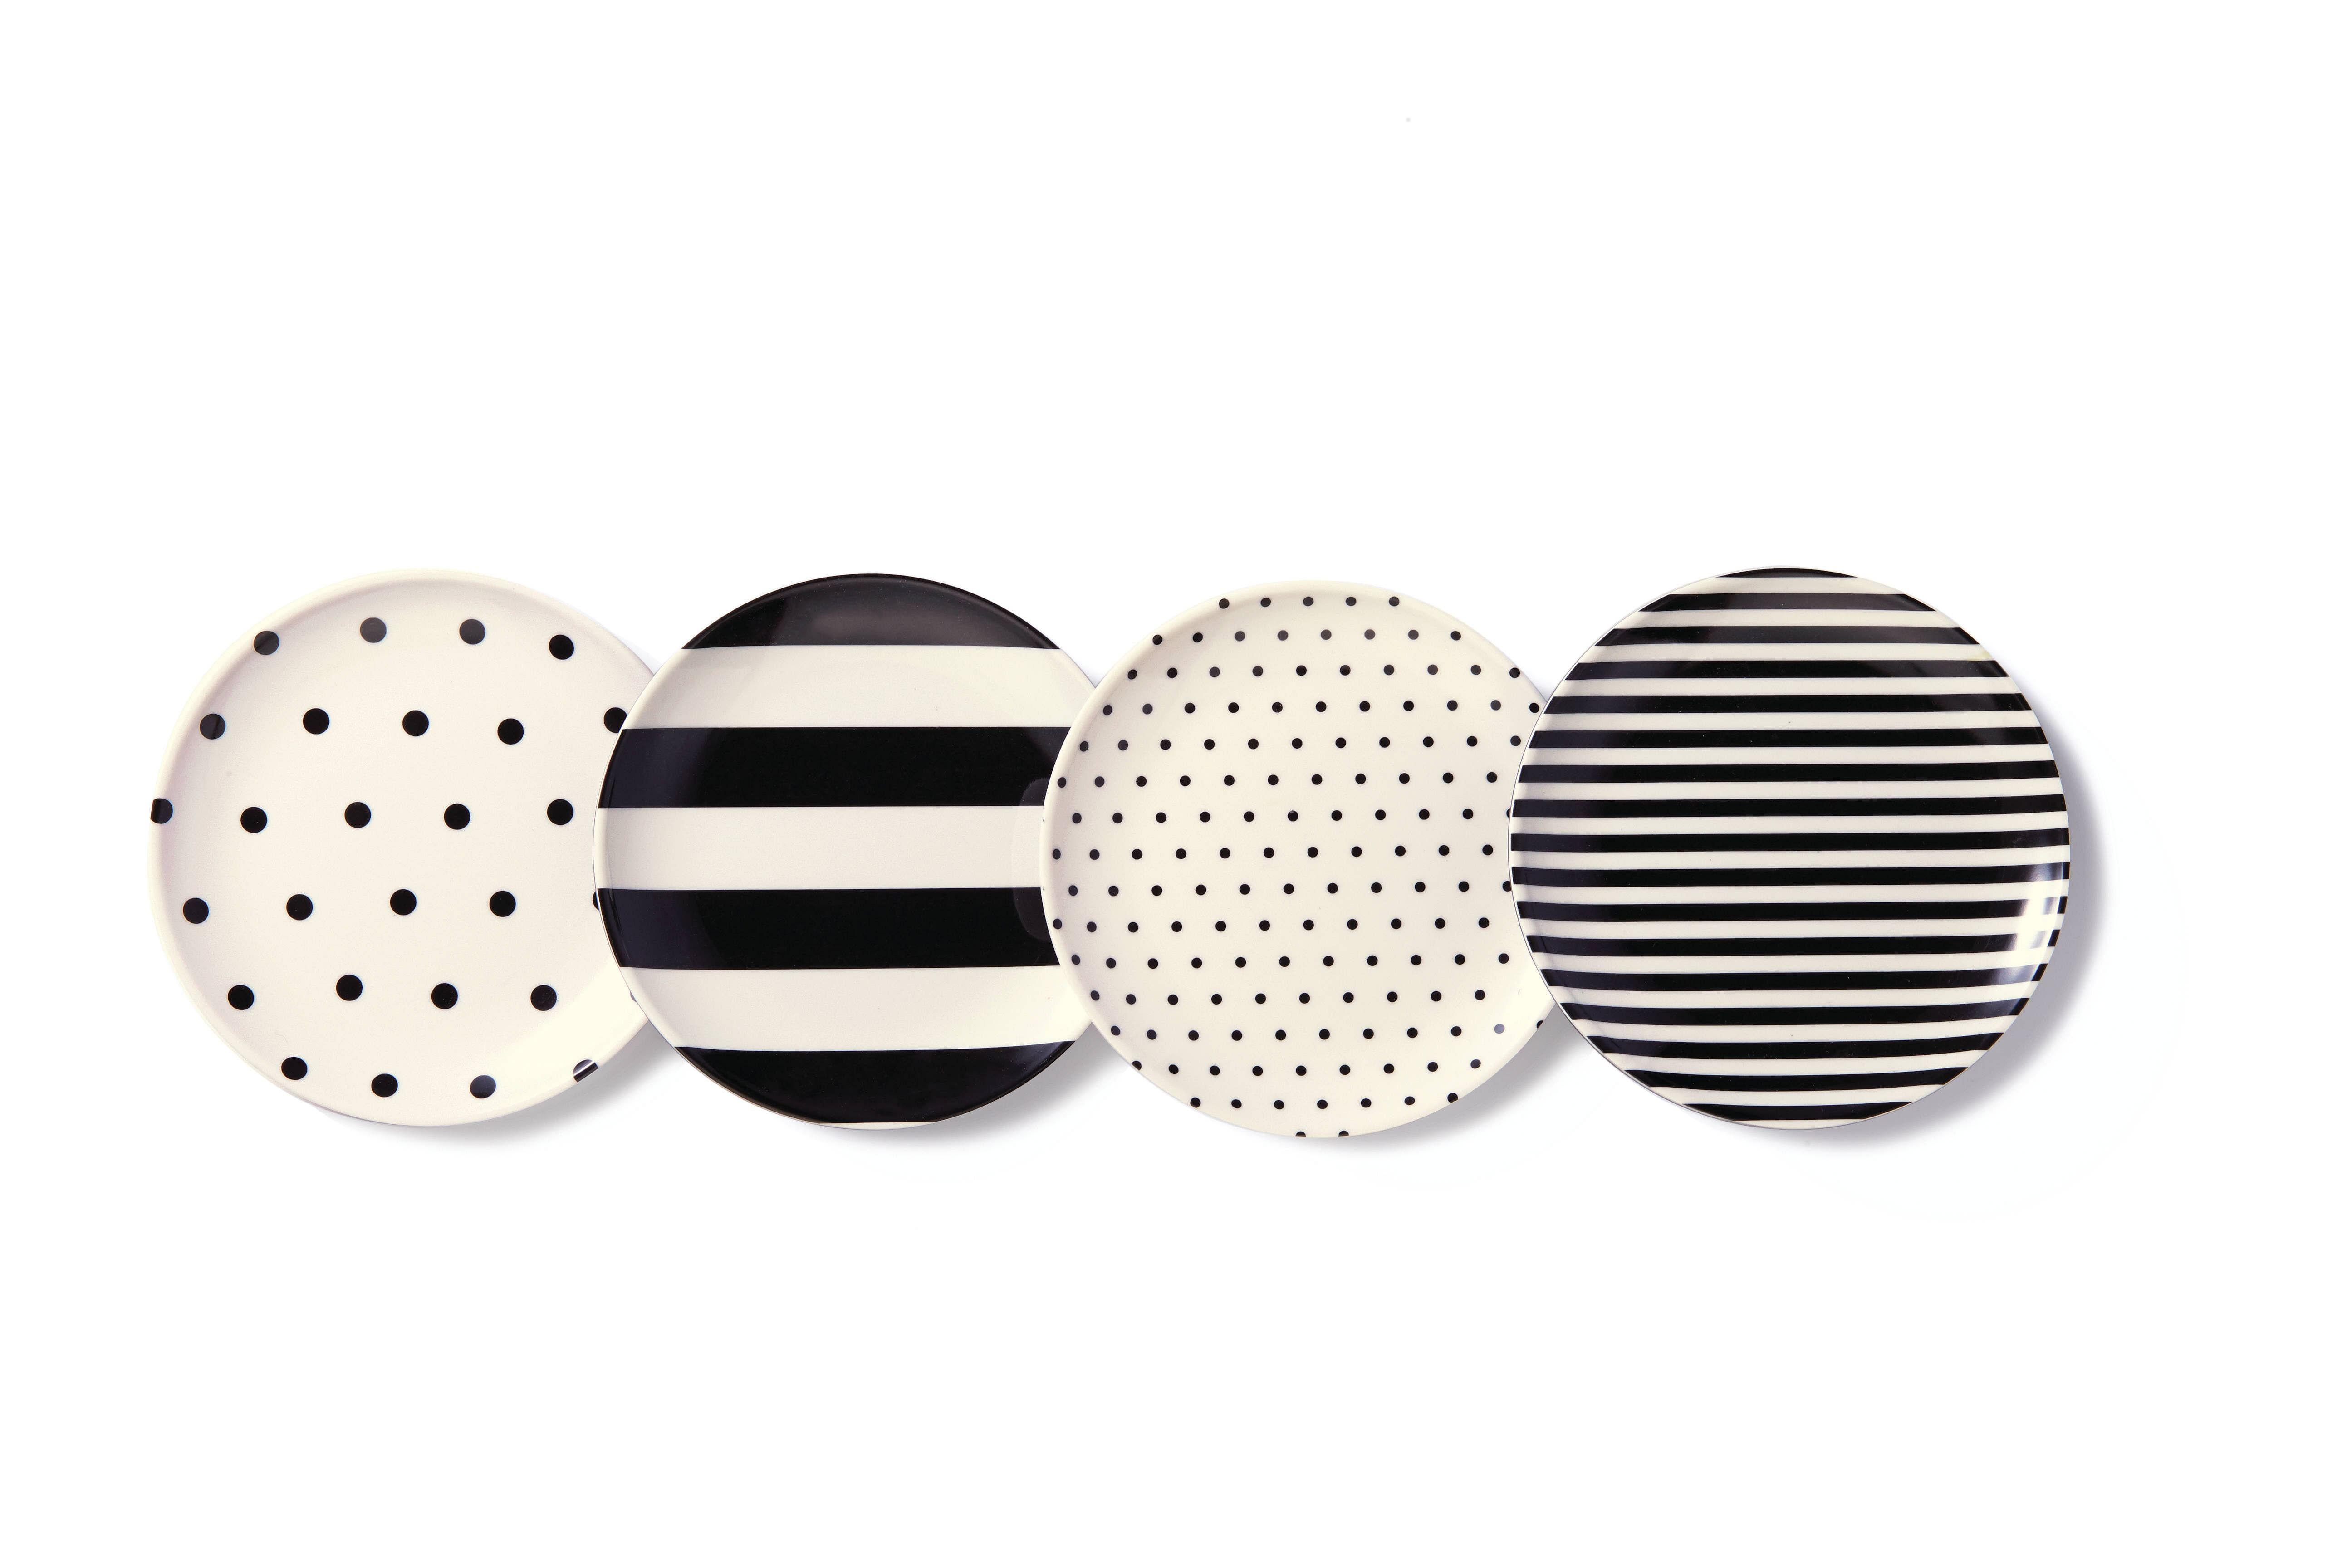 plates, polka dot, stripes, geometric pattern, tableware, melamine